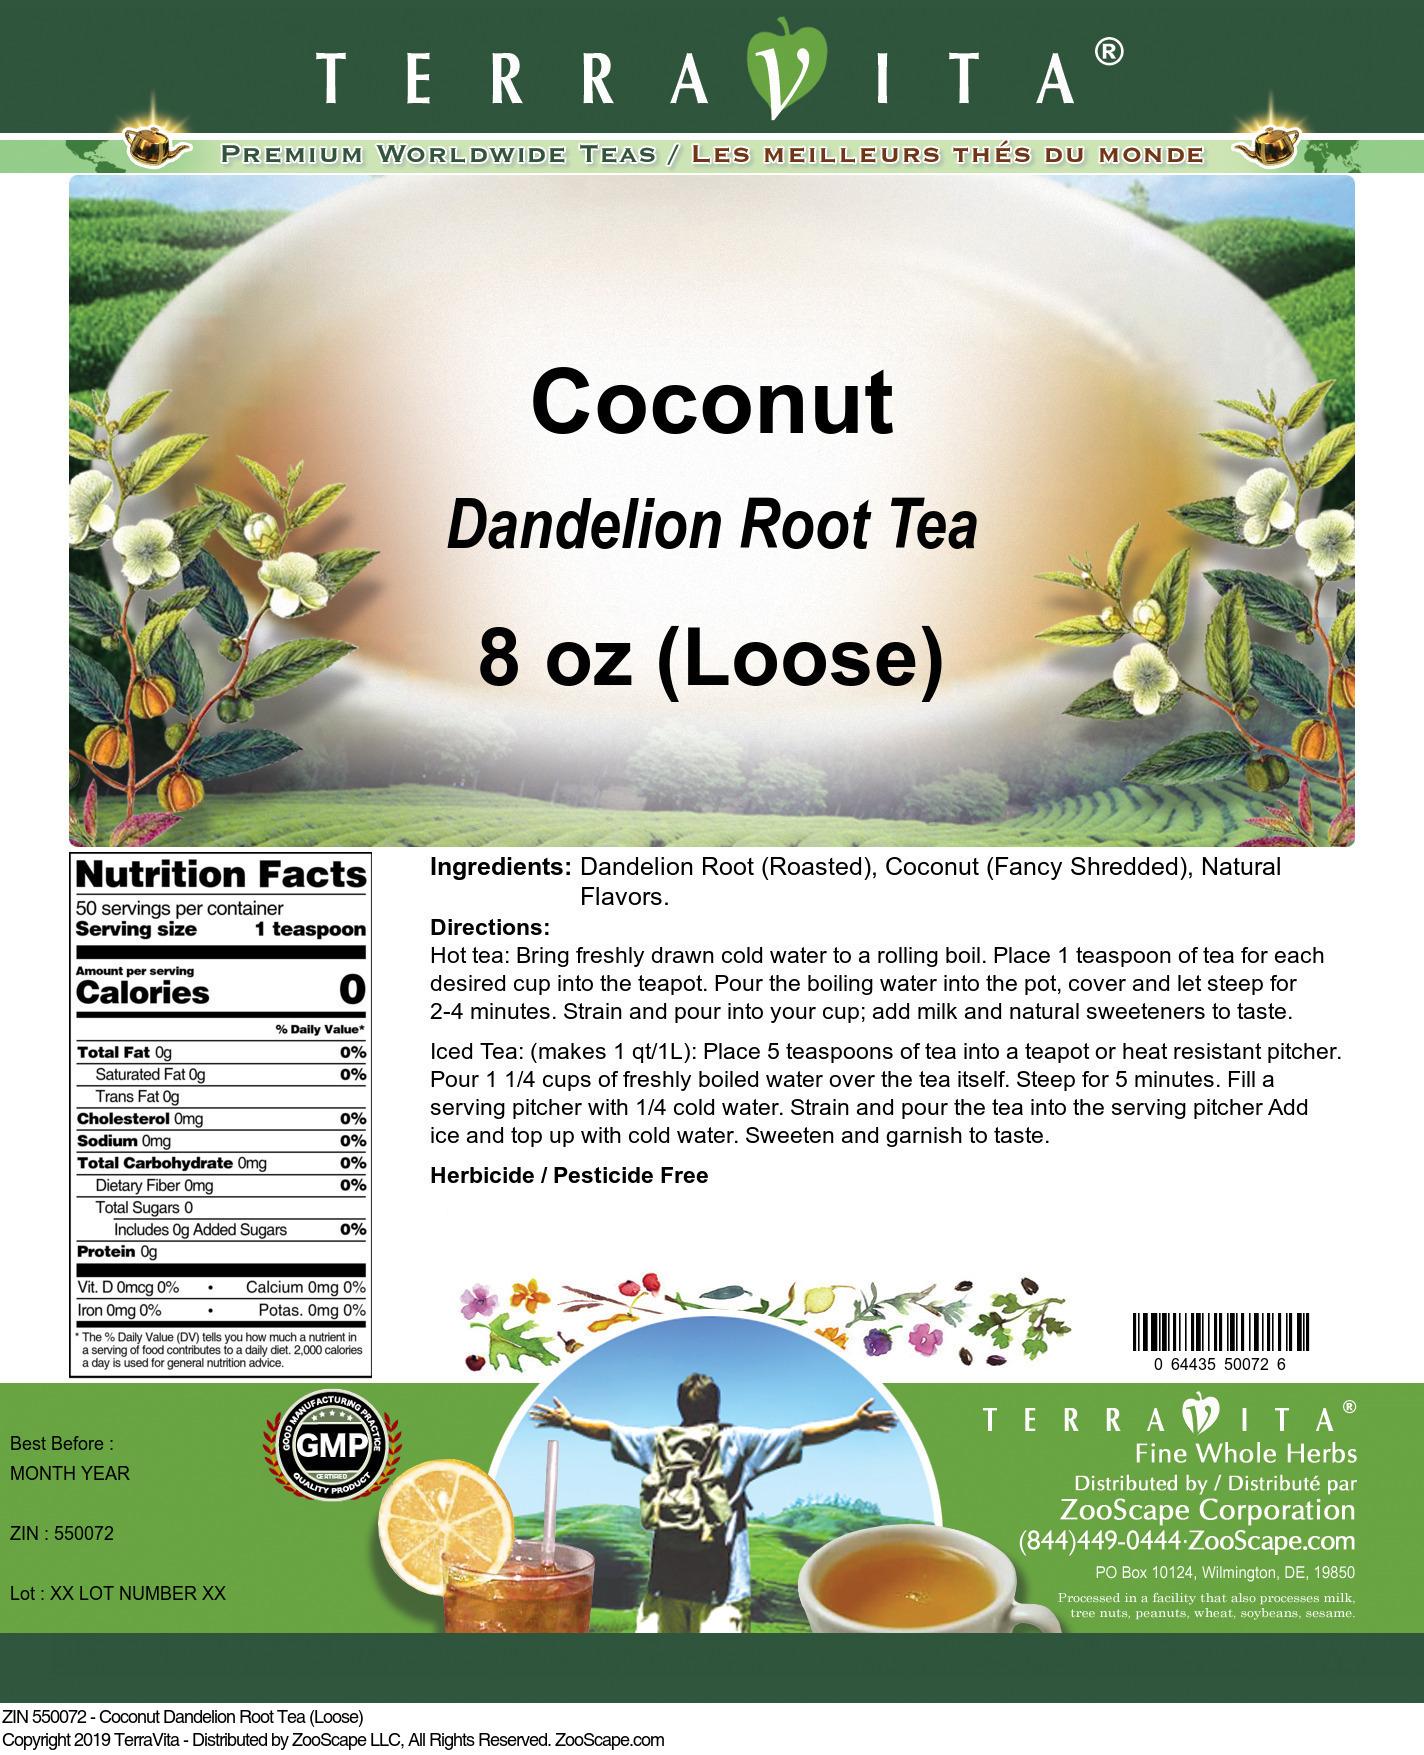 Coconut Dandelion Root Tea (Loose)